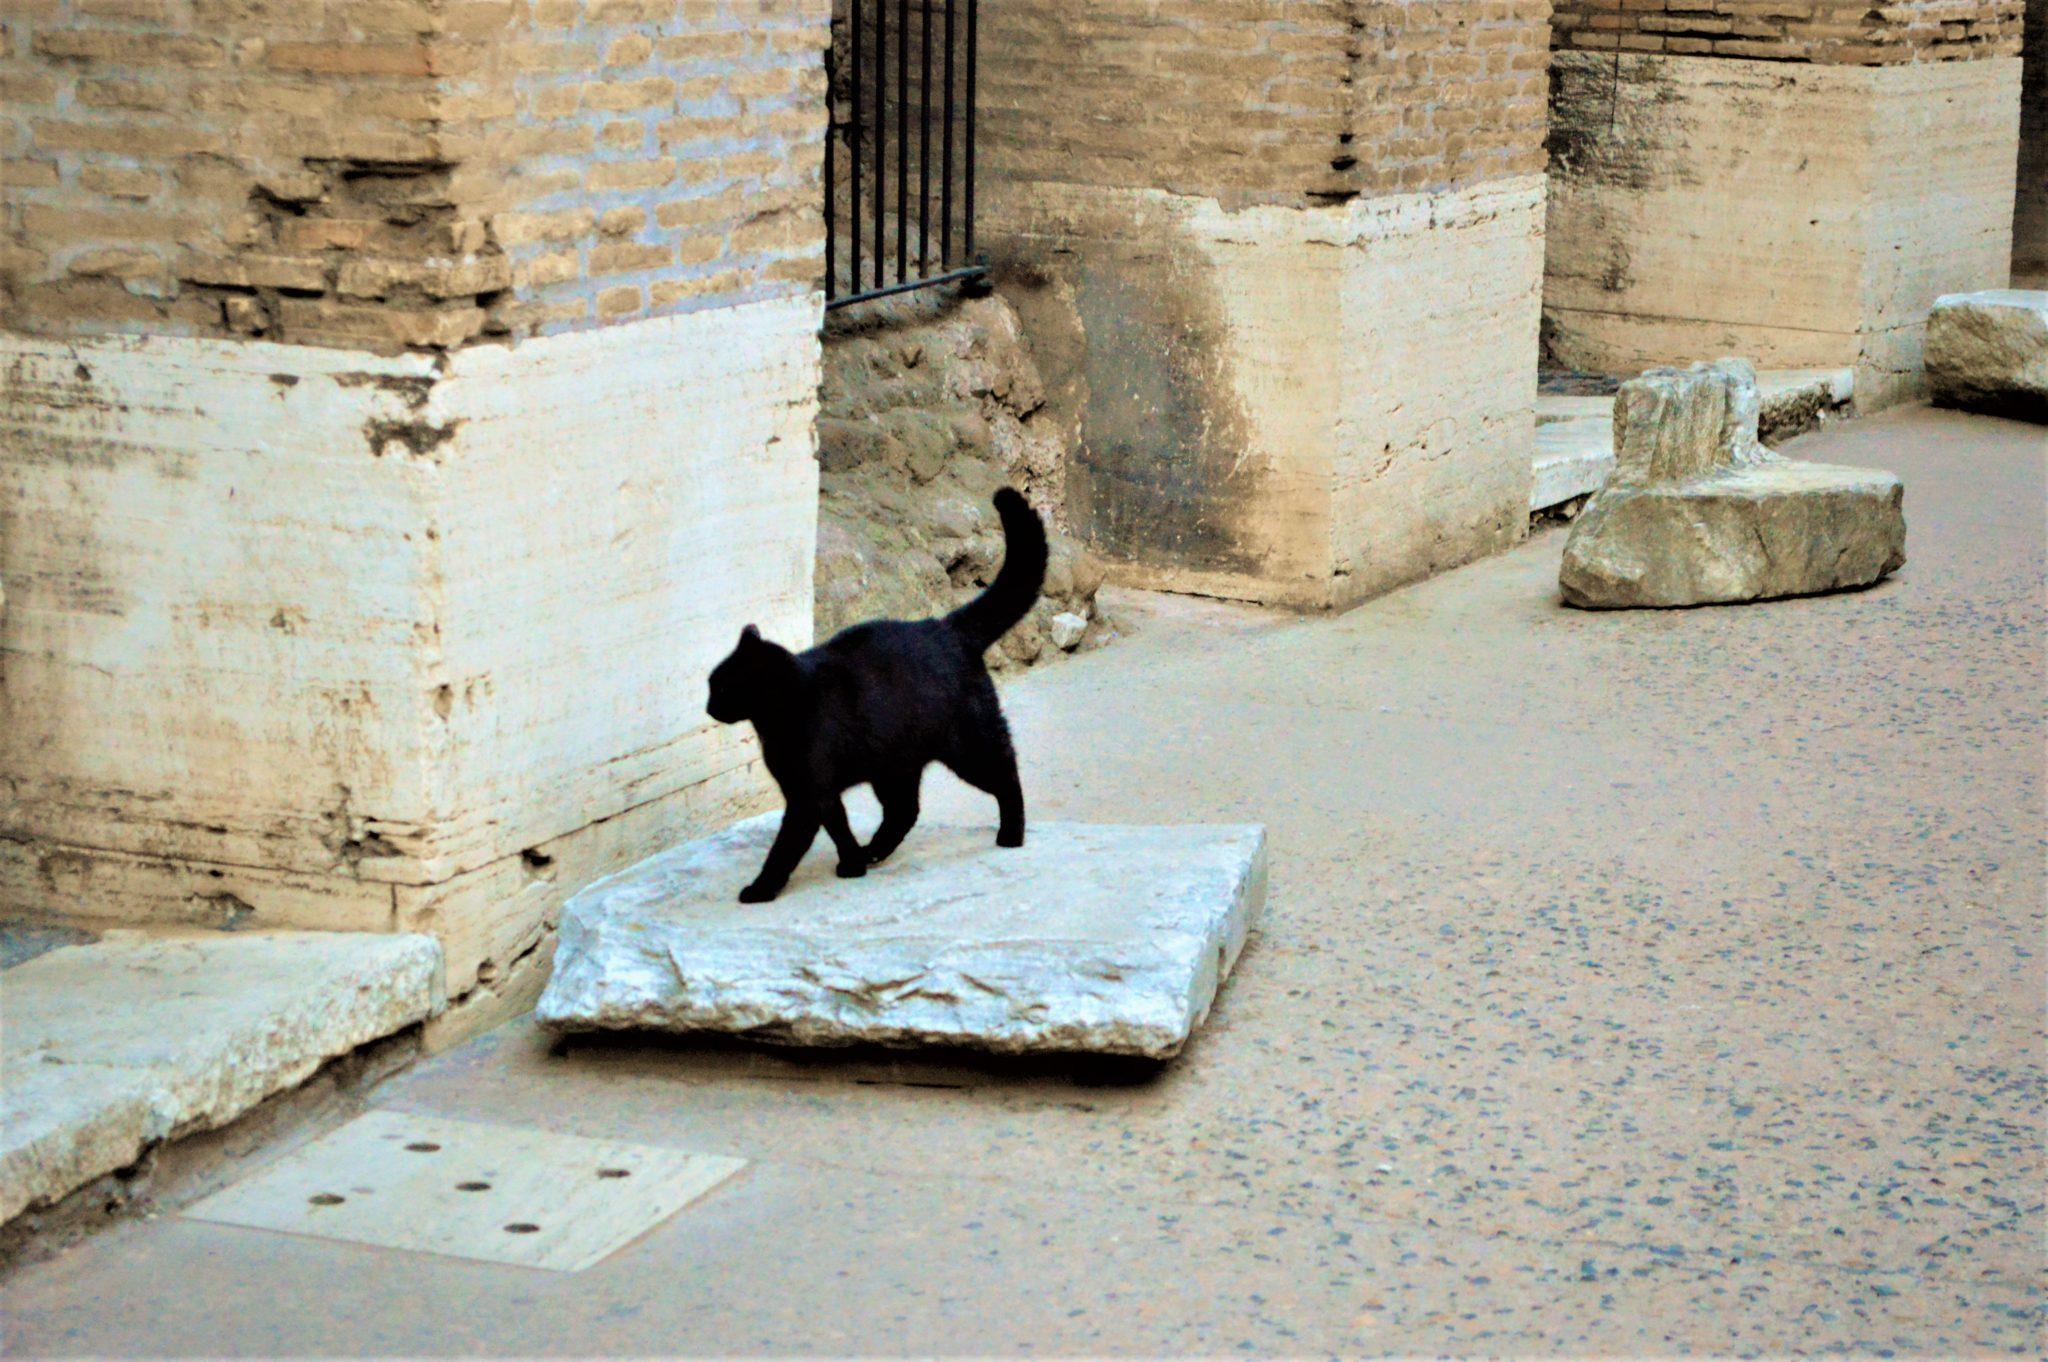 Resident cat inside the Colosseum, Rome, Italy